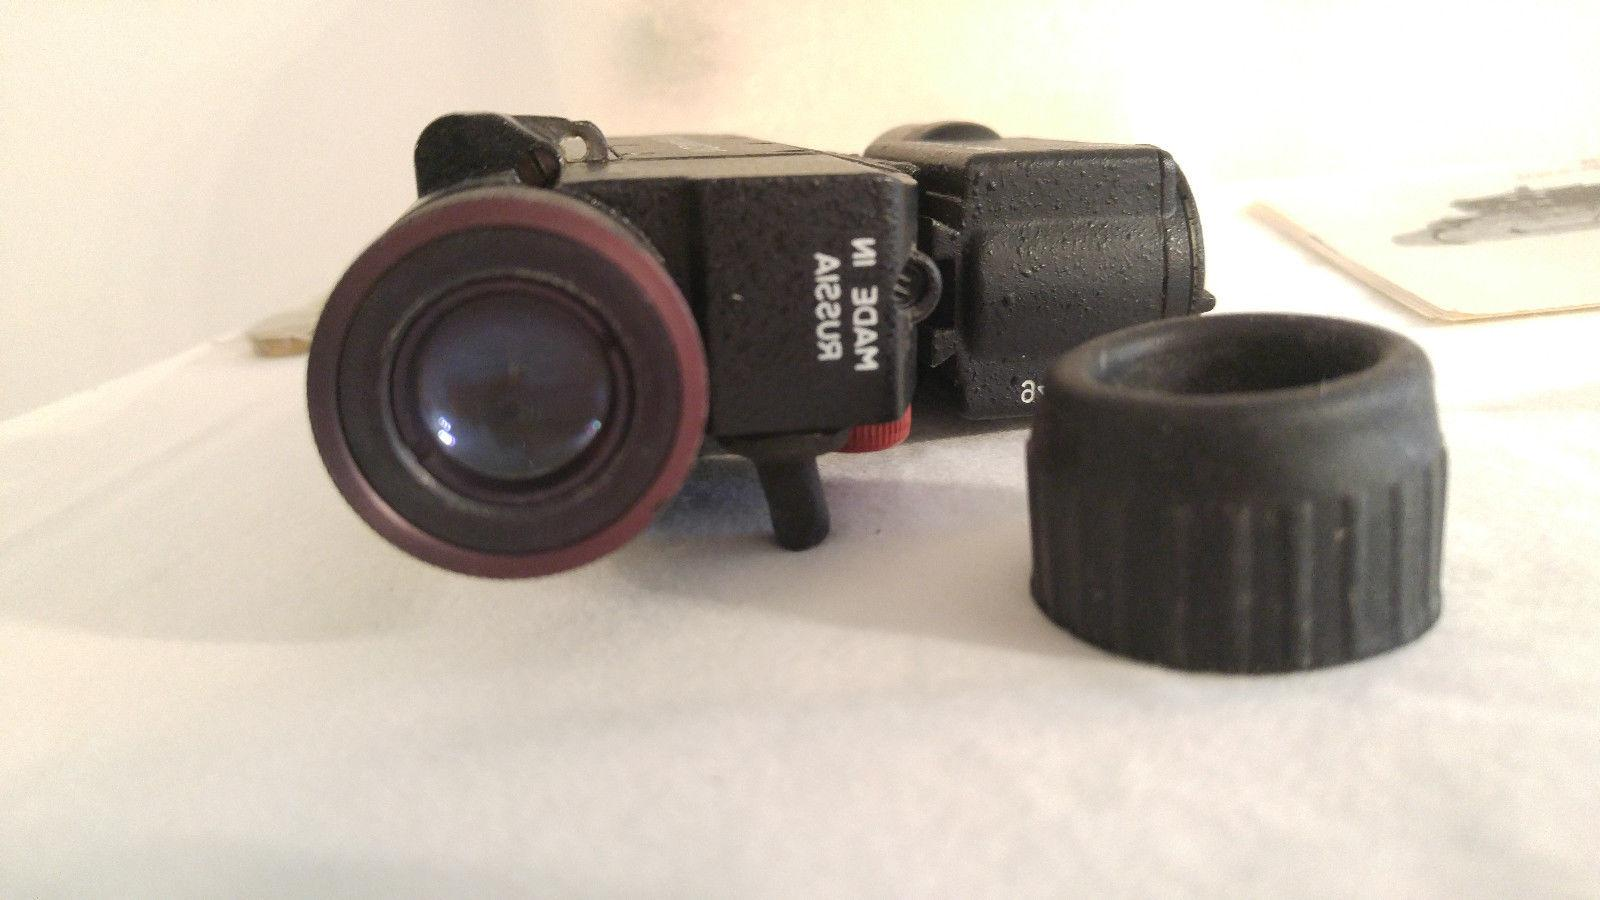 Night Optic Size Illuminator AP-4 MoonWalker